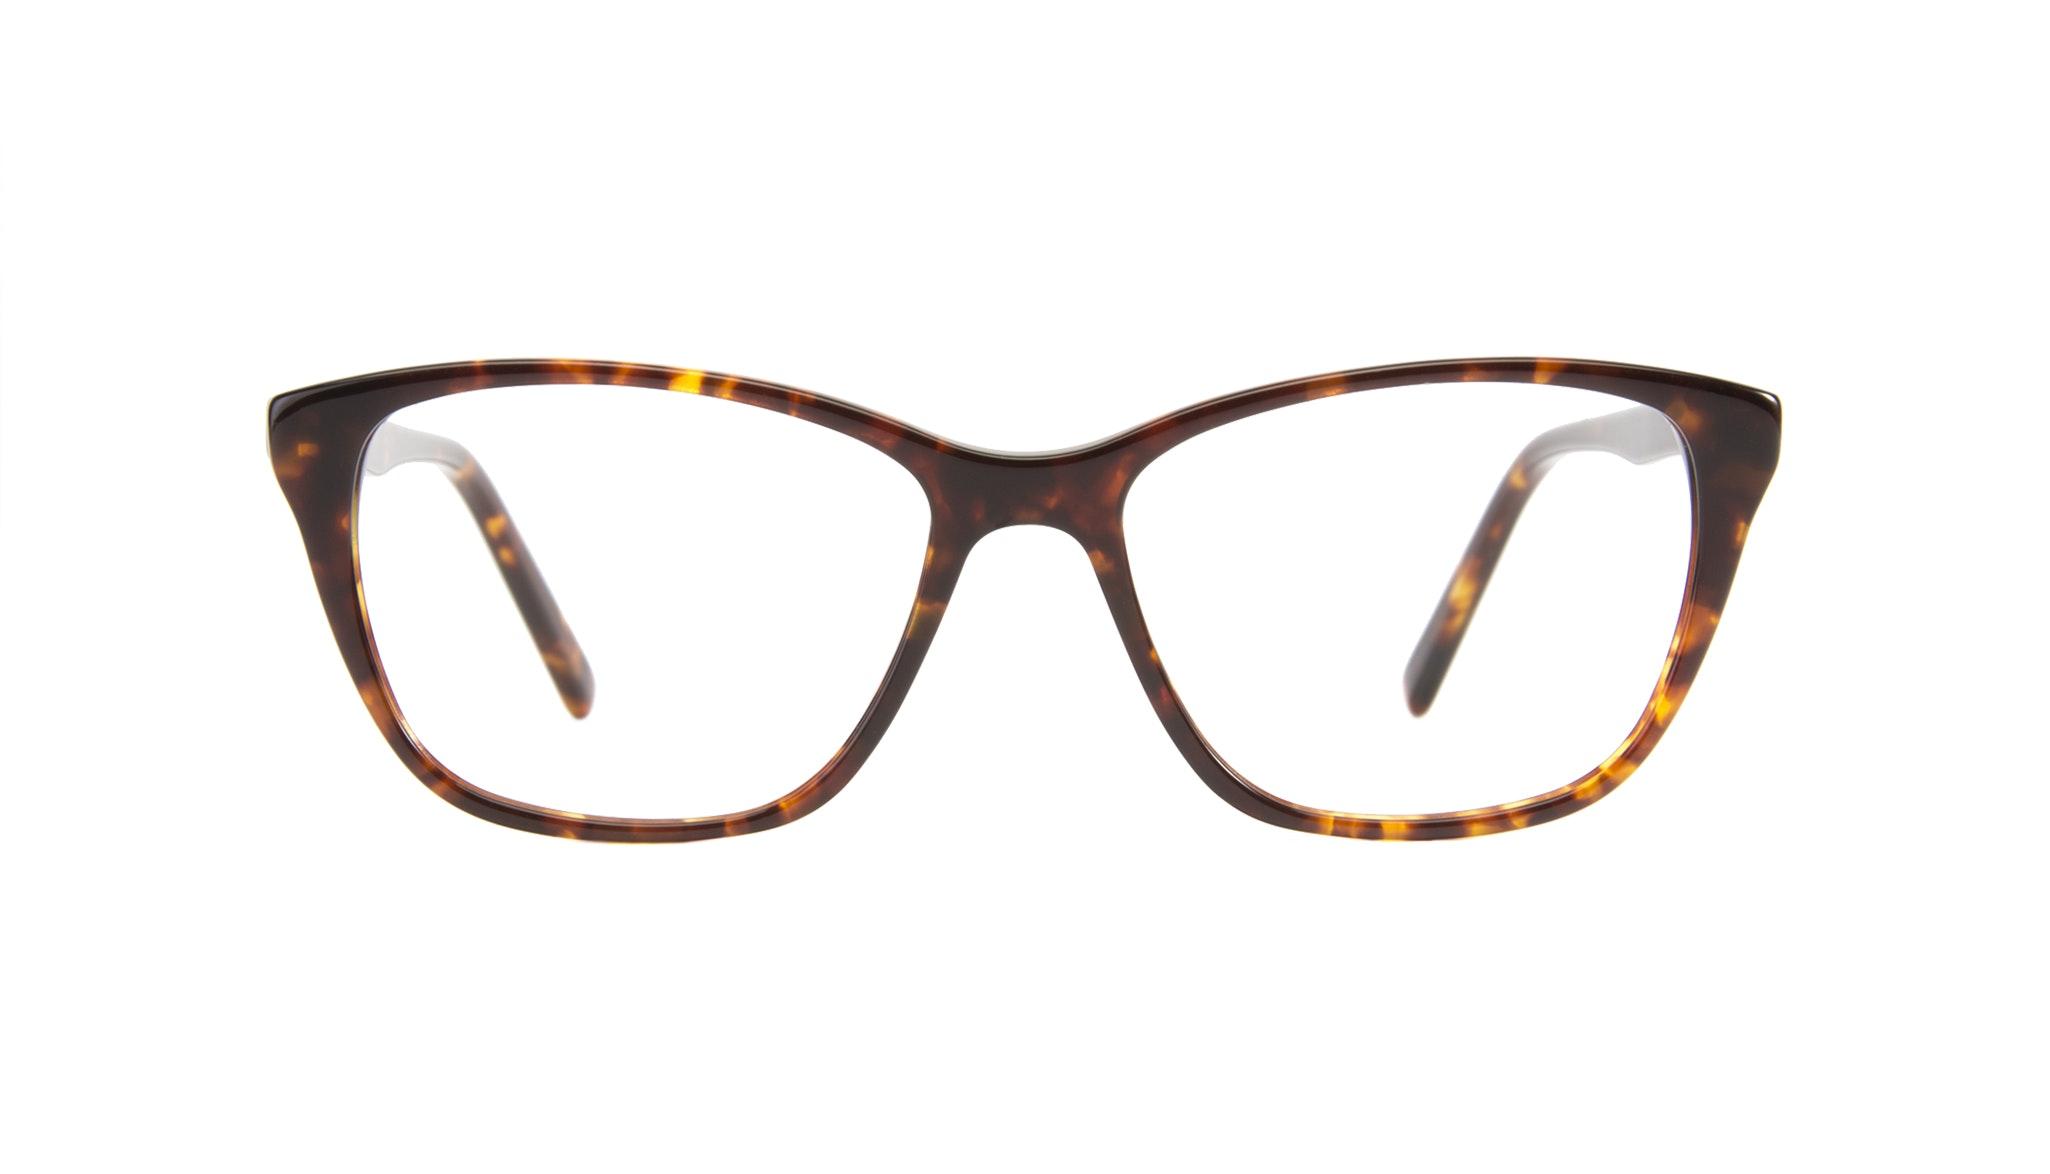 Affordable Fashion Glasses Cat Eye Eyeglasses Women Myrtle Petite Sepia Kiss